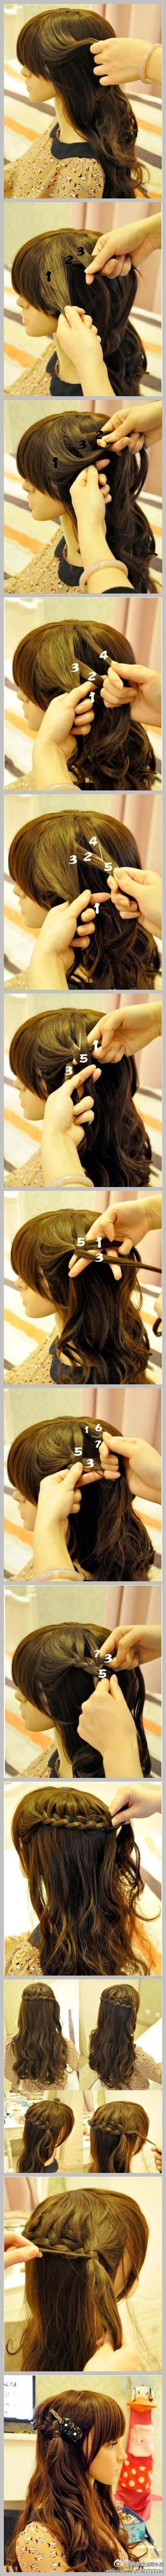 : Braids Hairstyles, French Braids, Waterfalls Braids, Braids Tutorials, Hairs Tutorials, Hairs Beauty, Diy'S Hairstyles, Hairs Styles, Braids Idea